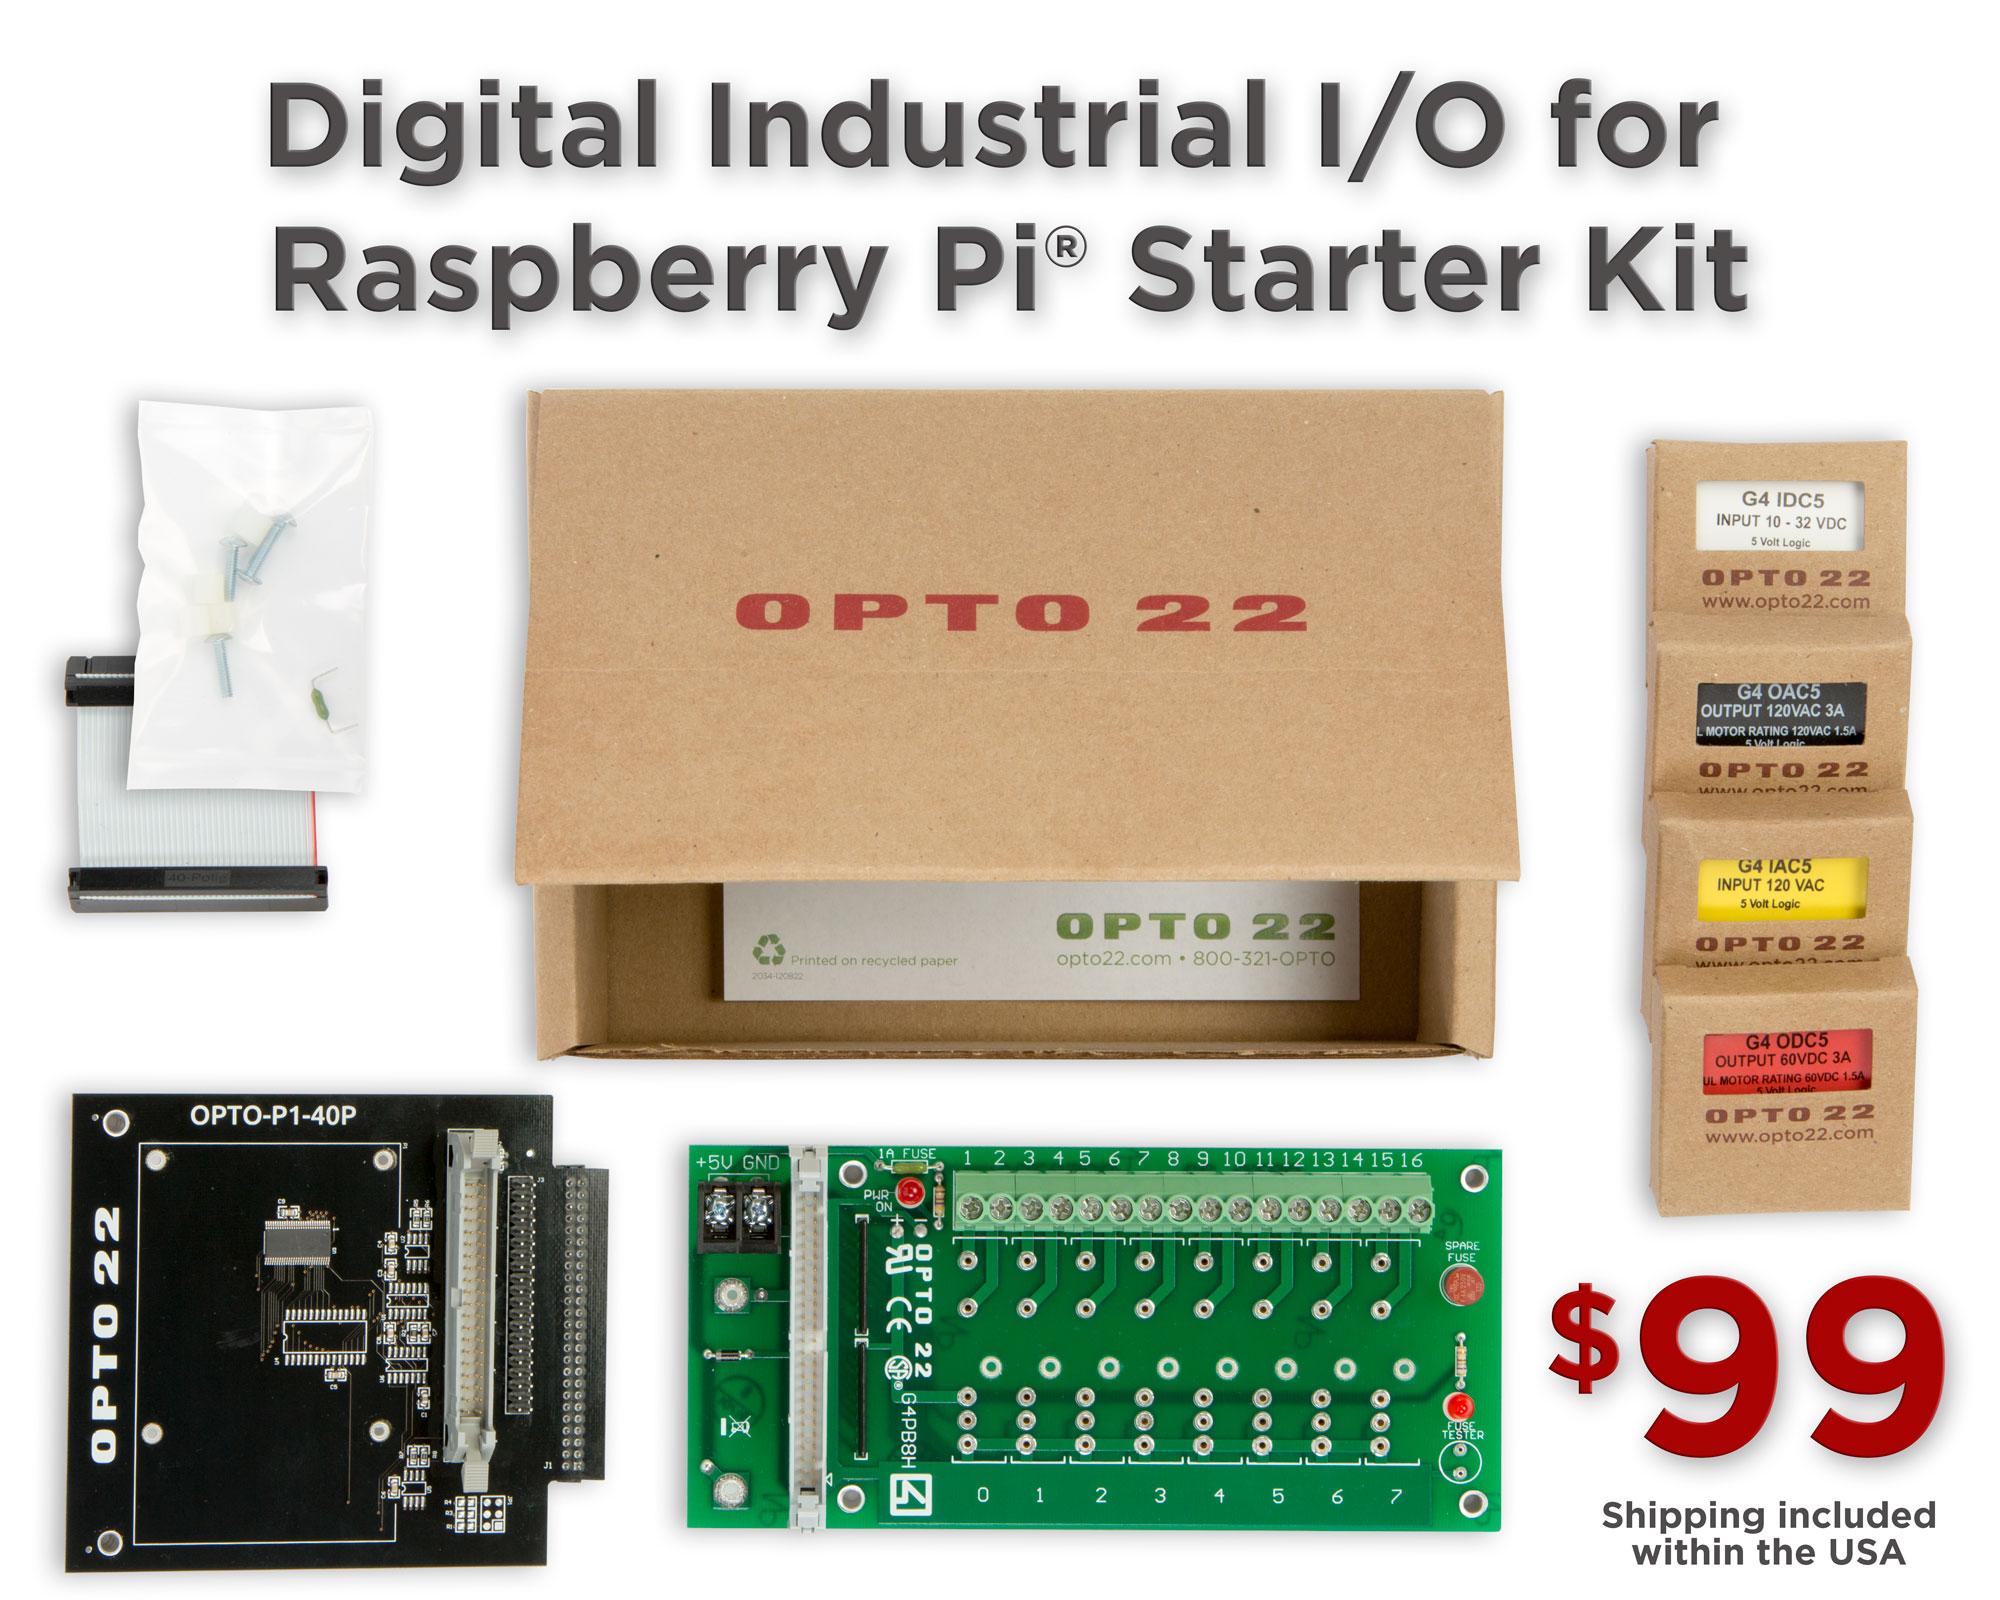 Industrial-Digital-IO-Raspberry-Pi-Starter-Kit.jpg